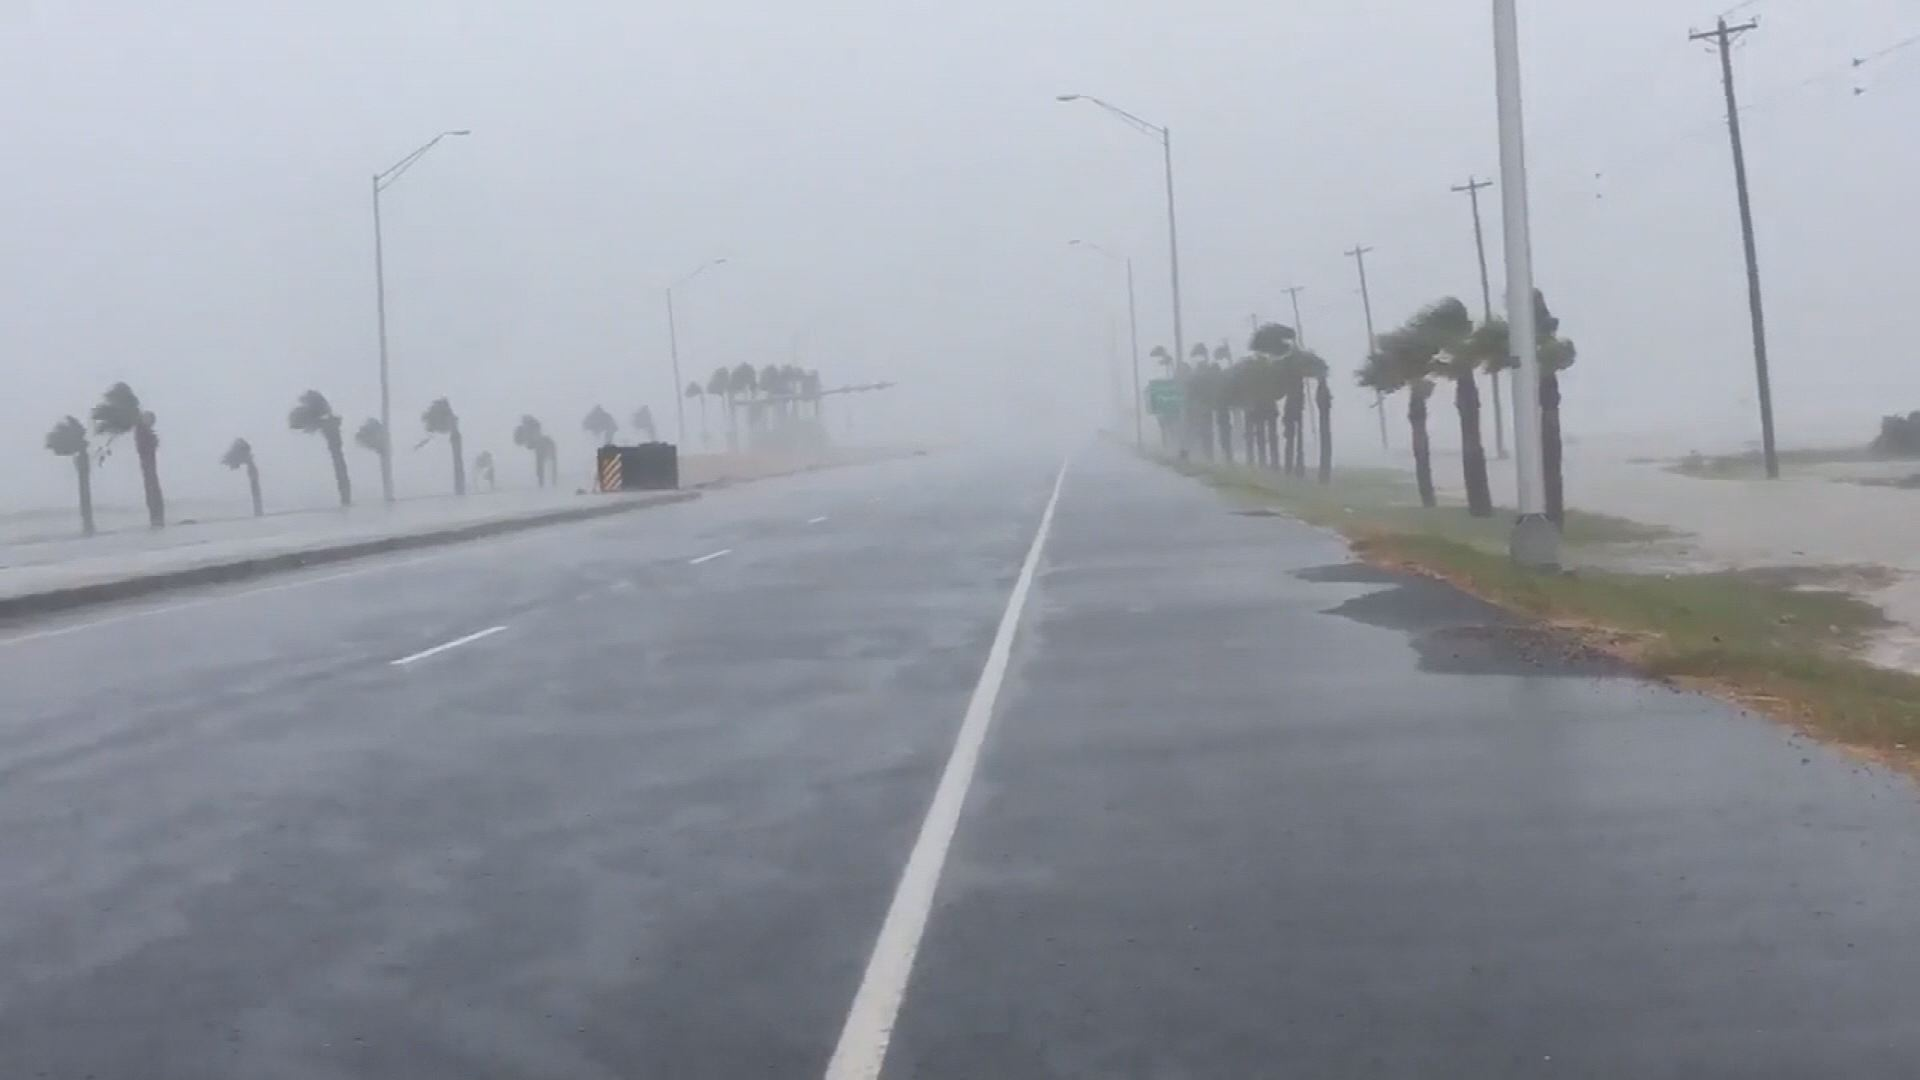 hurricane insurance_1526419511819.jpg.jpg